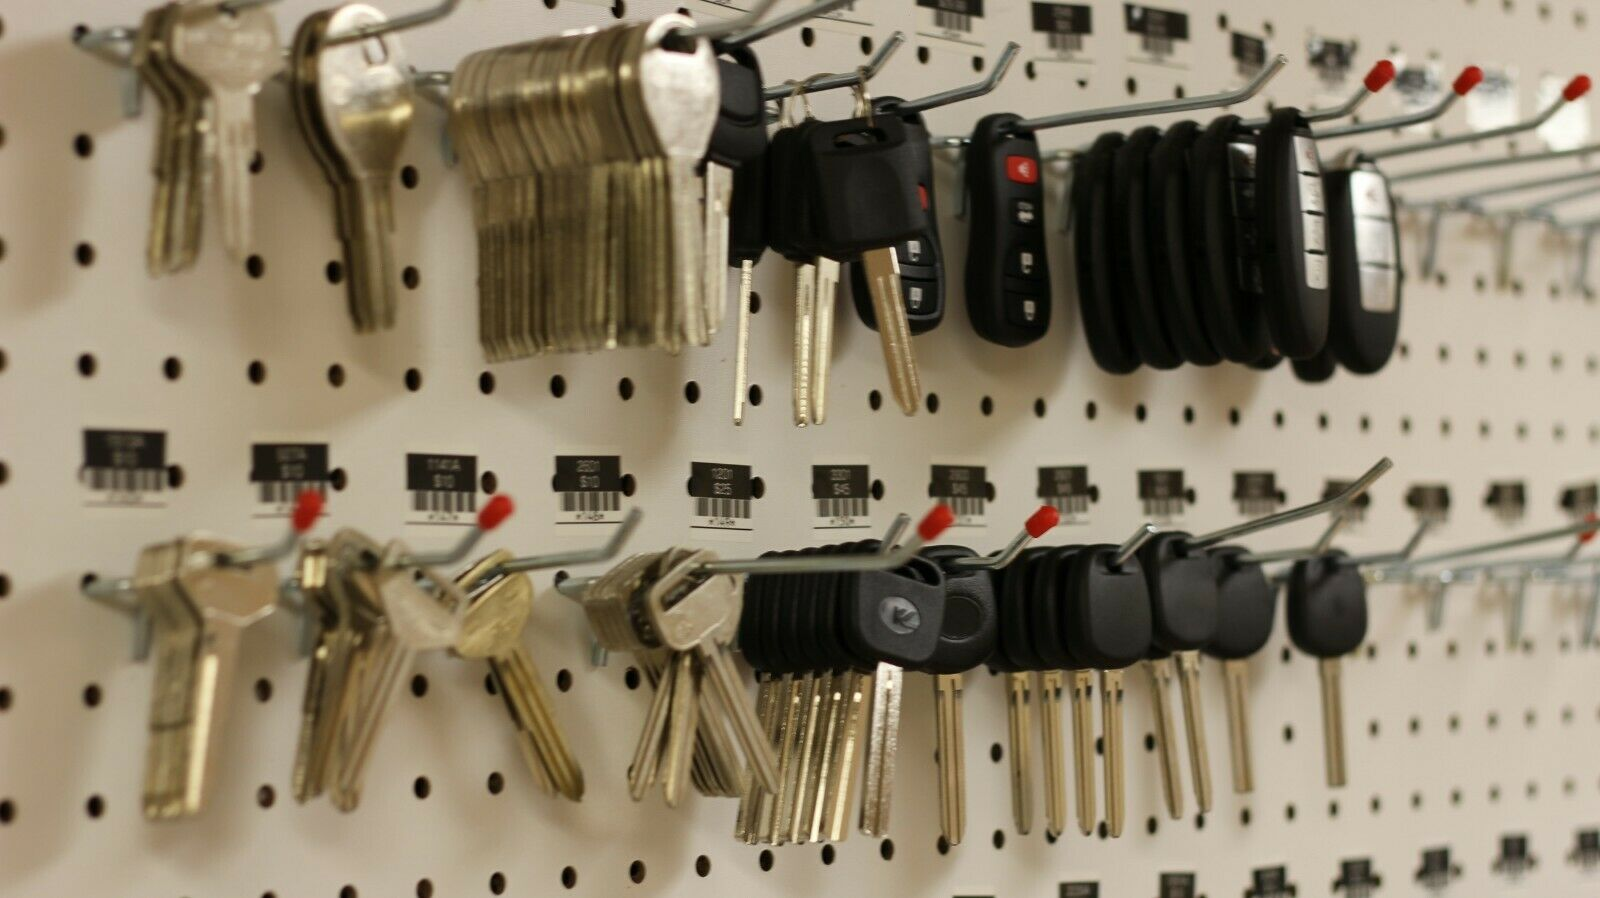 X2201-X2240 KEY Keys for Master padlock #1 cut to your code Licensed Locksmith.